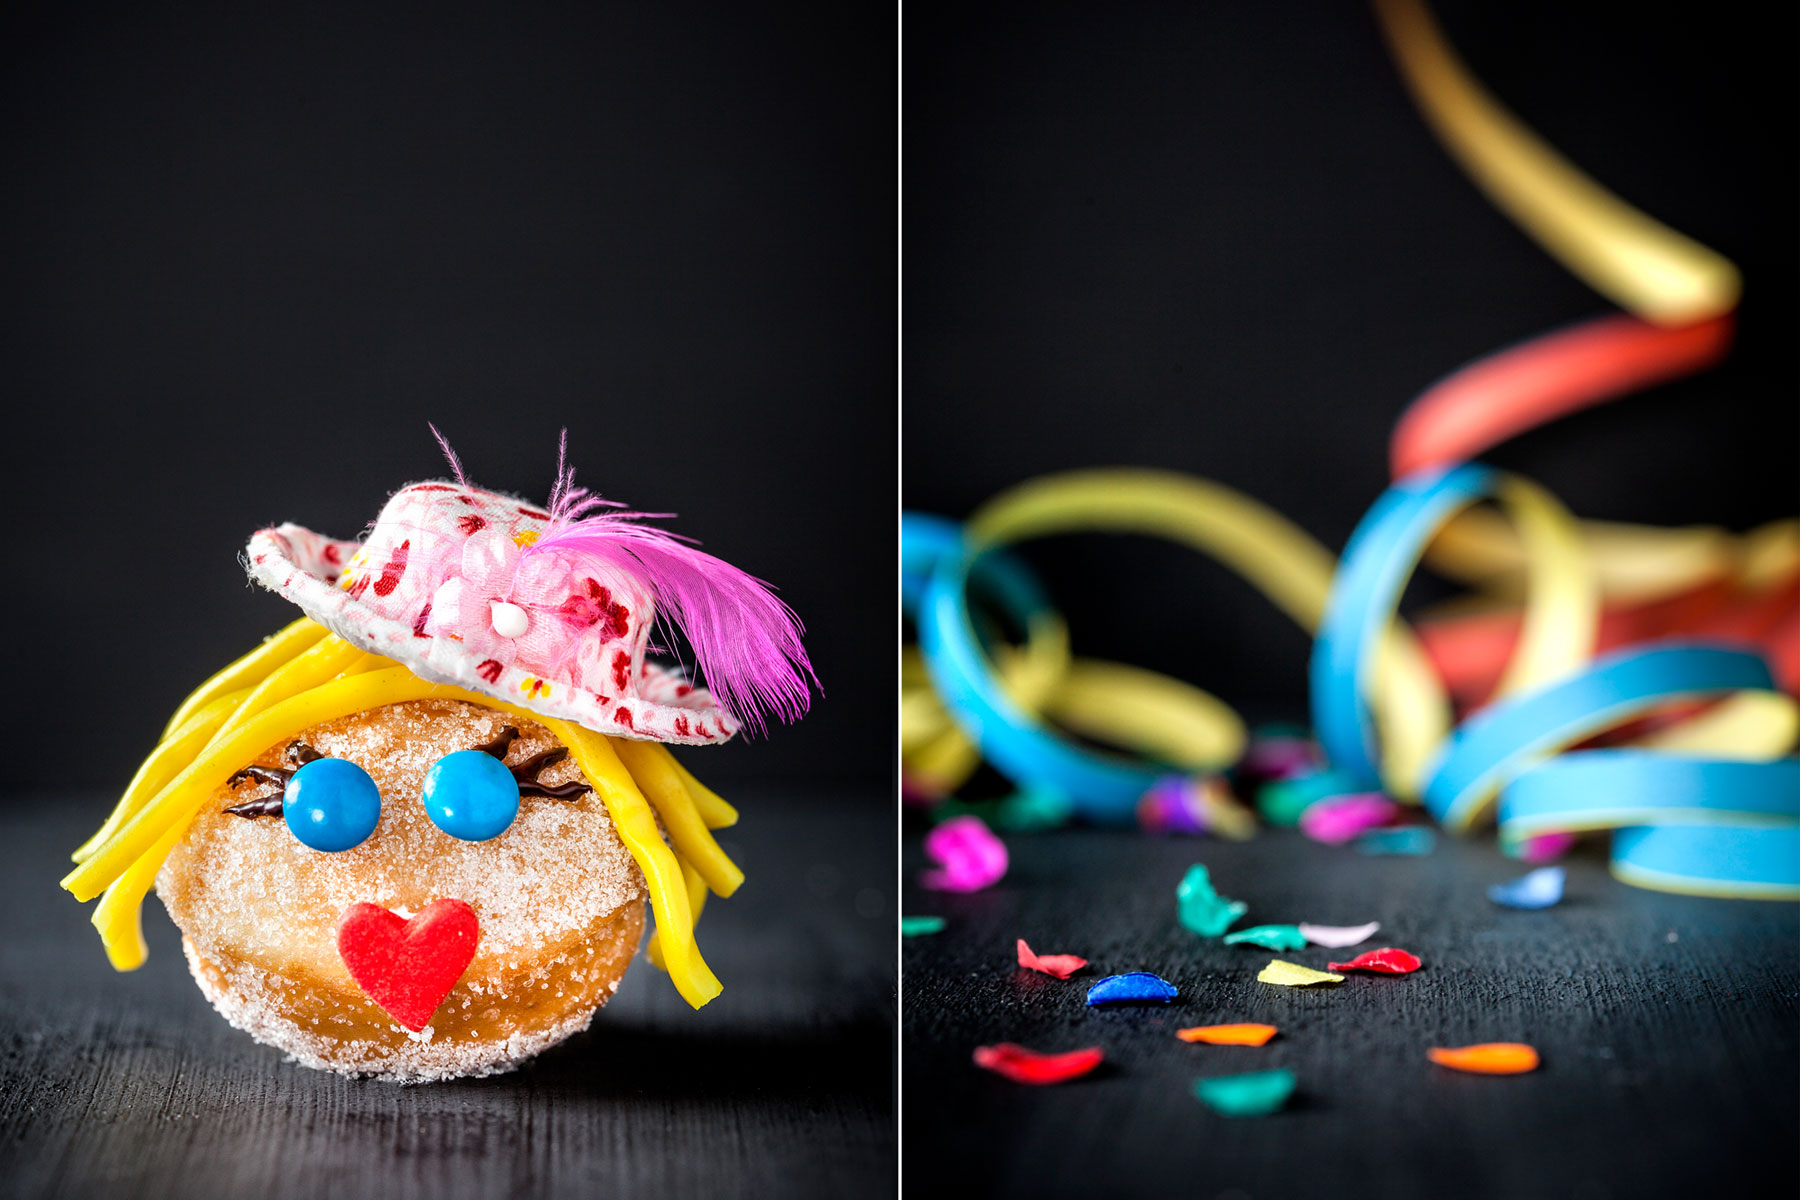 Mini-Berliner Rezept plus Dekoidee als Karnevalskuchen dekoriert